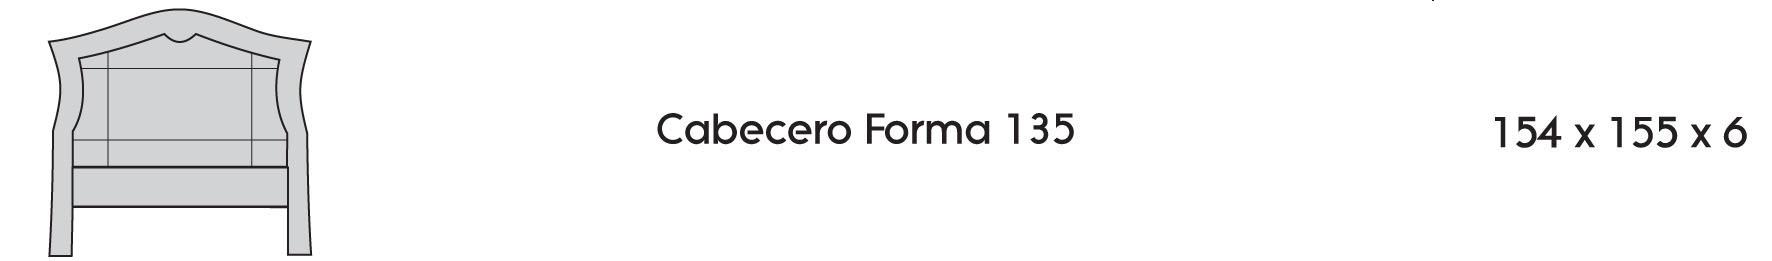 Cabecero Forma